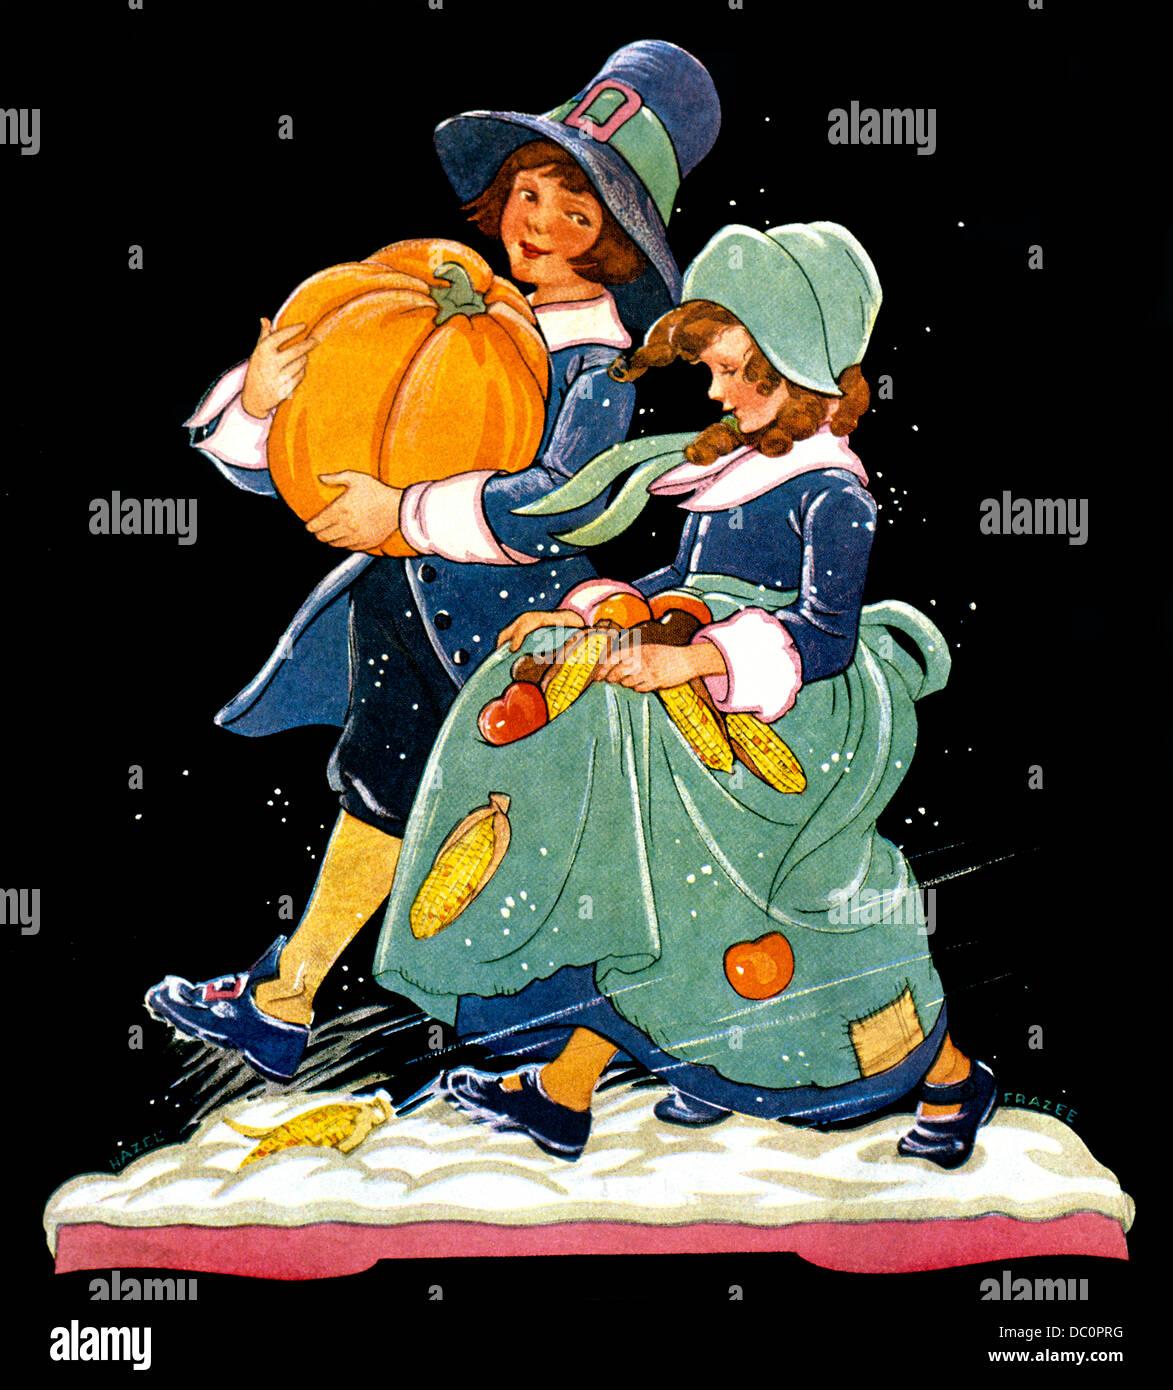 1930s ILLUSTRATION BOY AND GIRL DRESSED AS PILGRIMS CARRYING PUMPKIN FALL HARVEST VEGETABLES THANKSGIVING - Stock Image